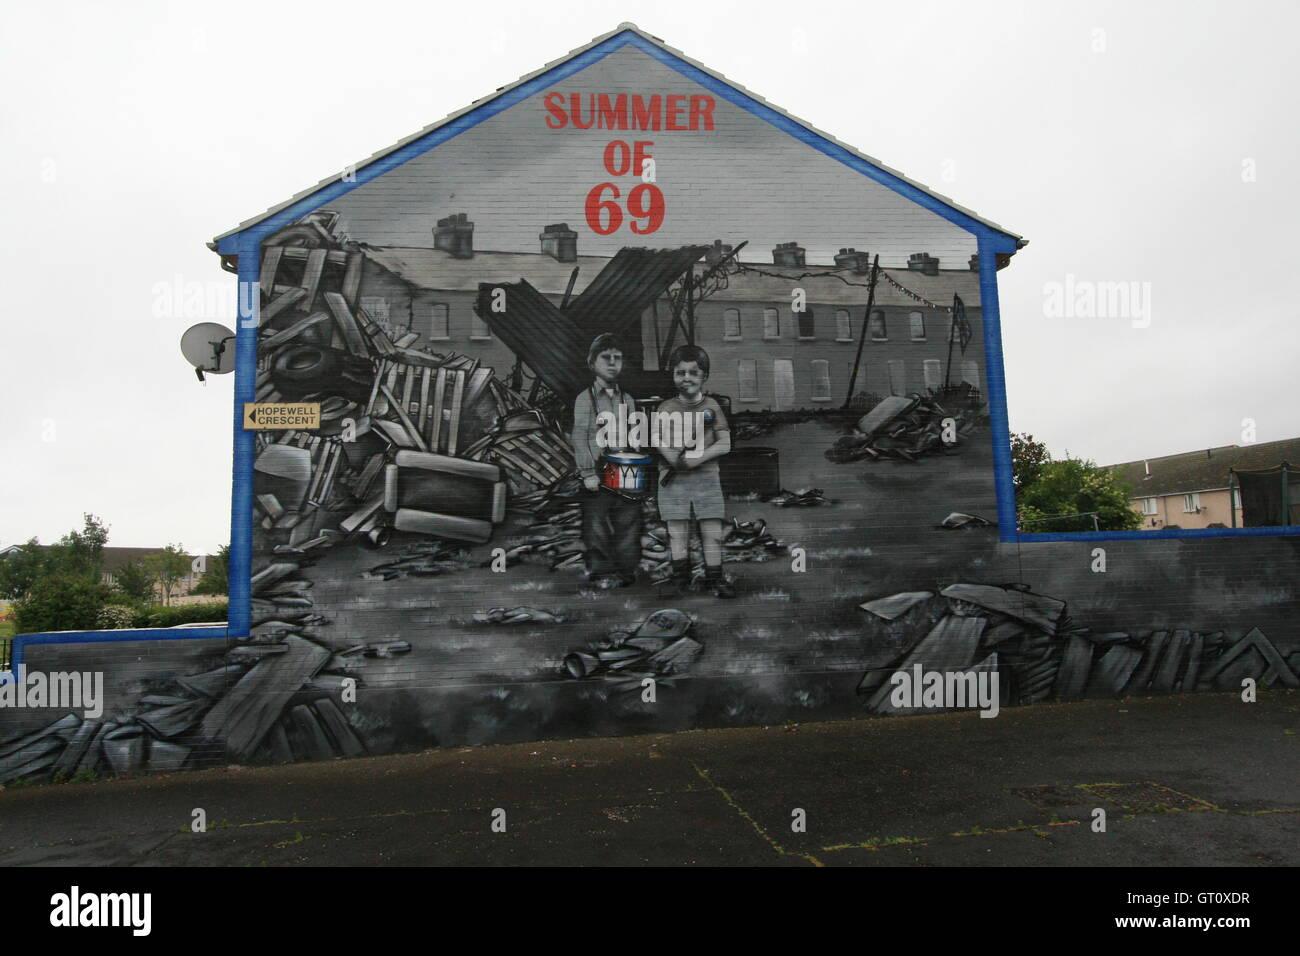 Unionist political mural commemorating 1969 Northern Ireland riots, Shankill Road, Belfast, Northern Ireland, UK. - Stock Image